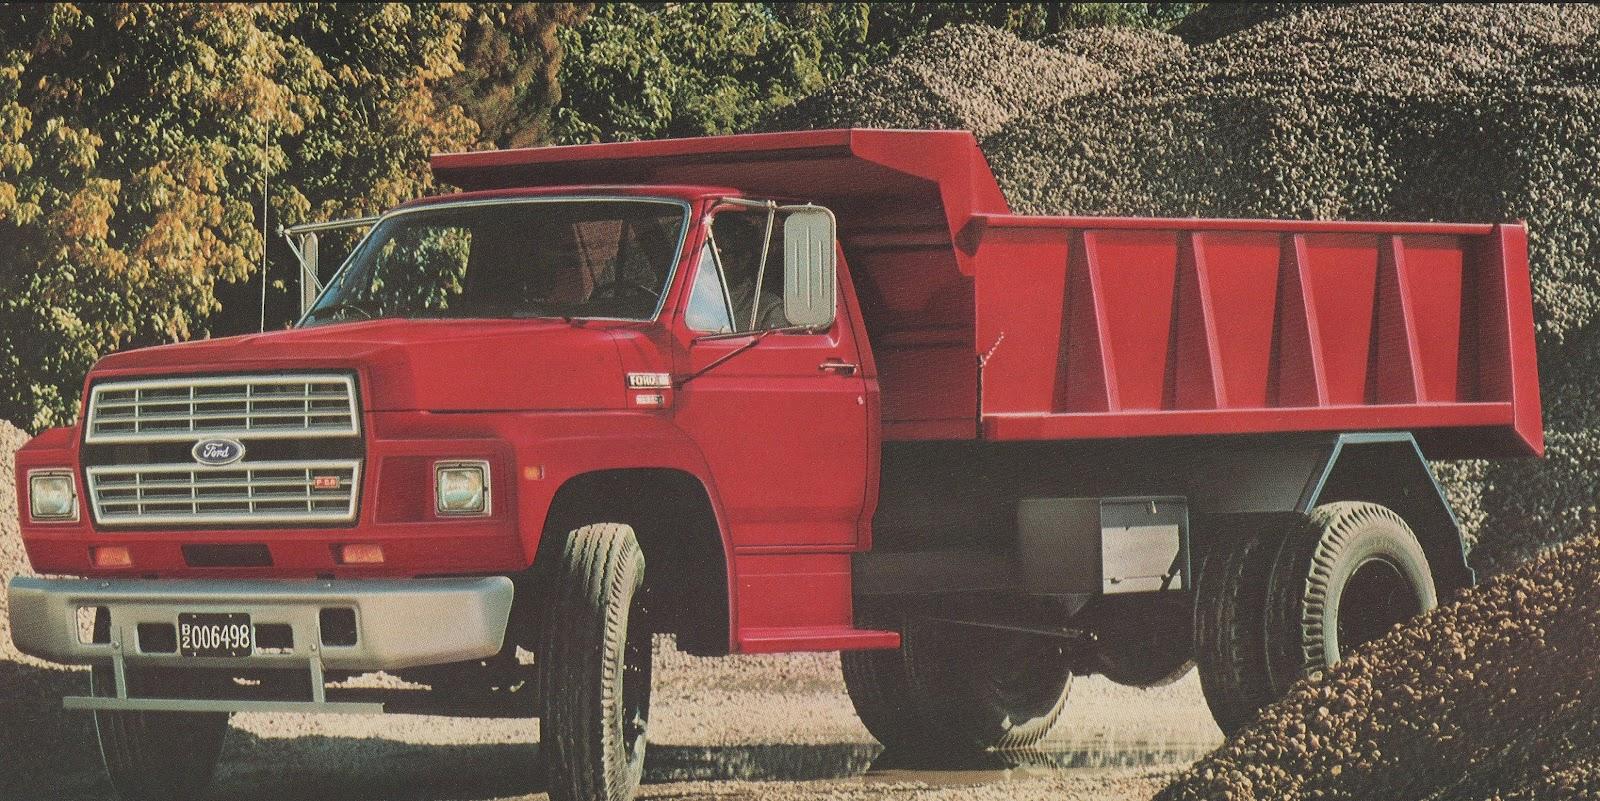 Archivo de autos ford f 7000 1985 for Camiones ford interior